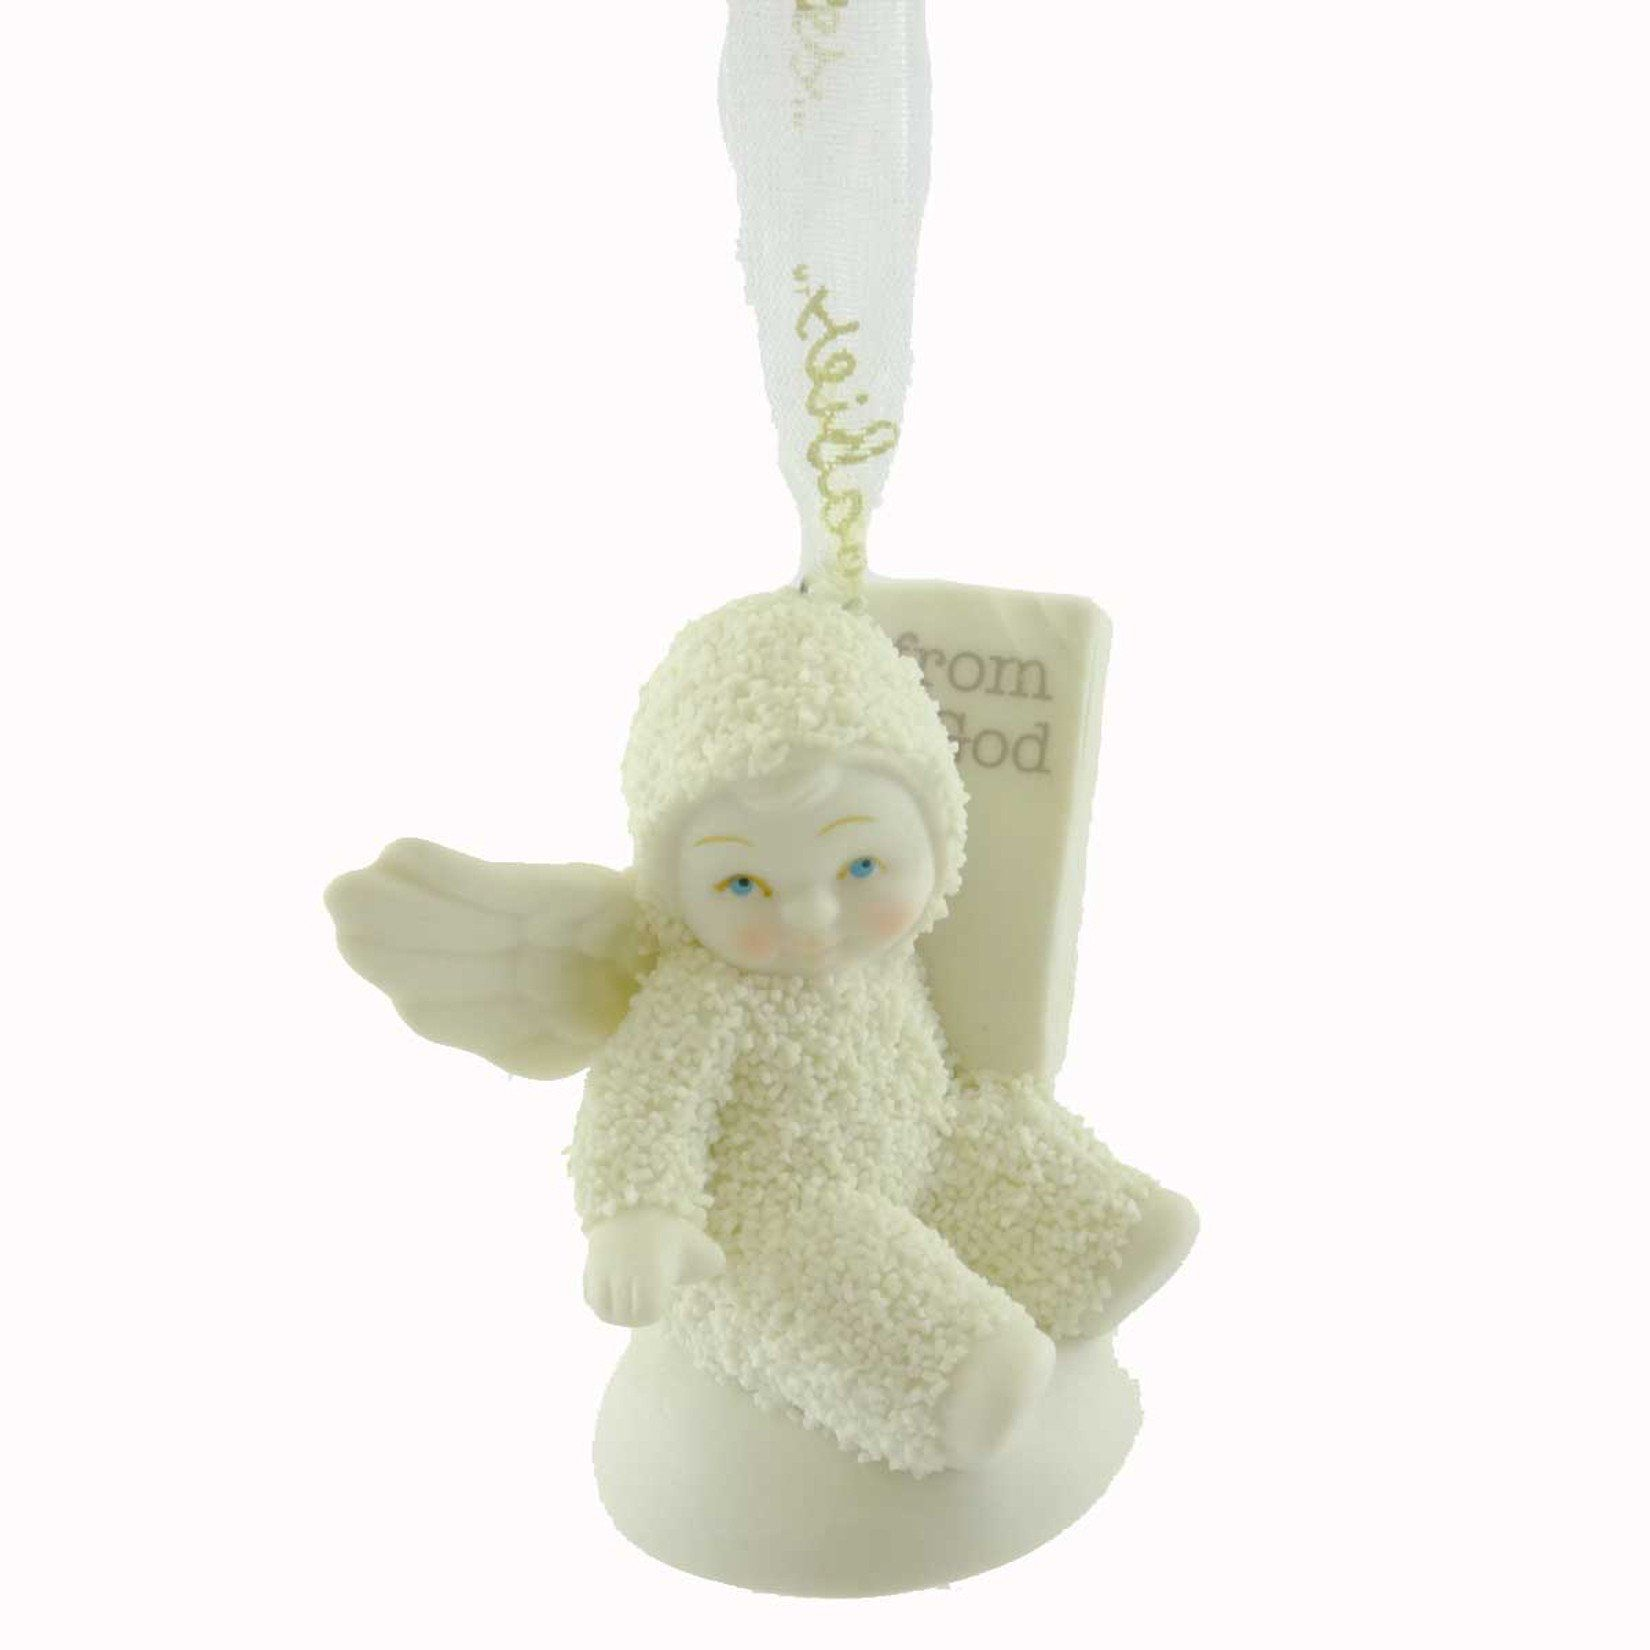 Dept 56 Snowbabies From God Ornament Resin Ornament